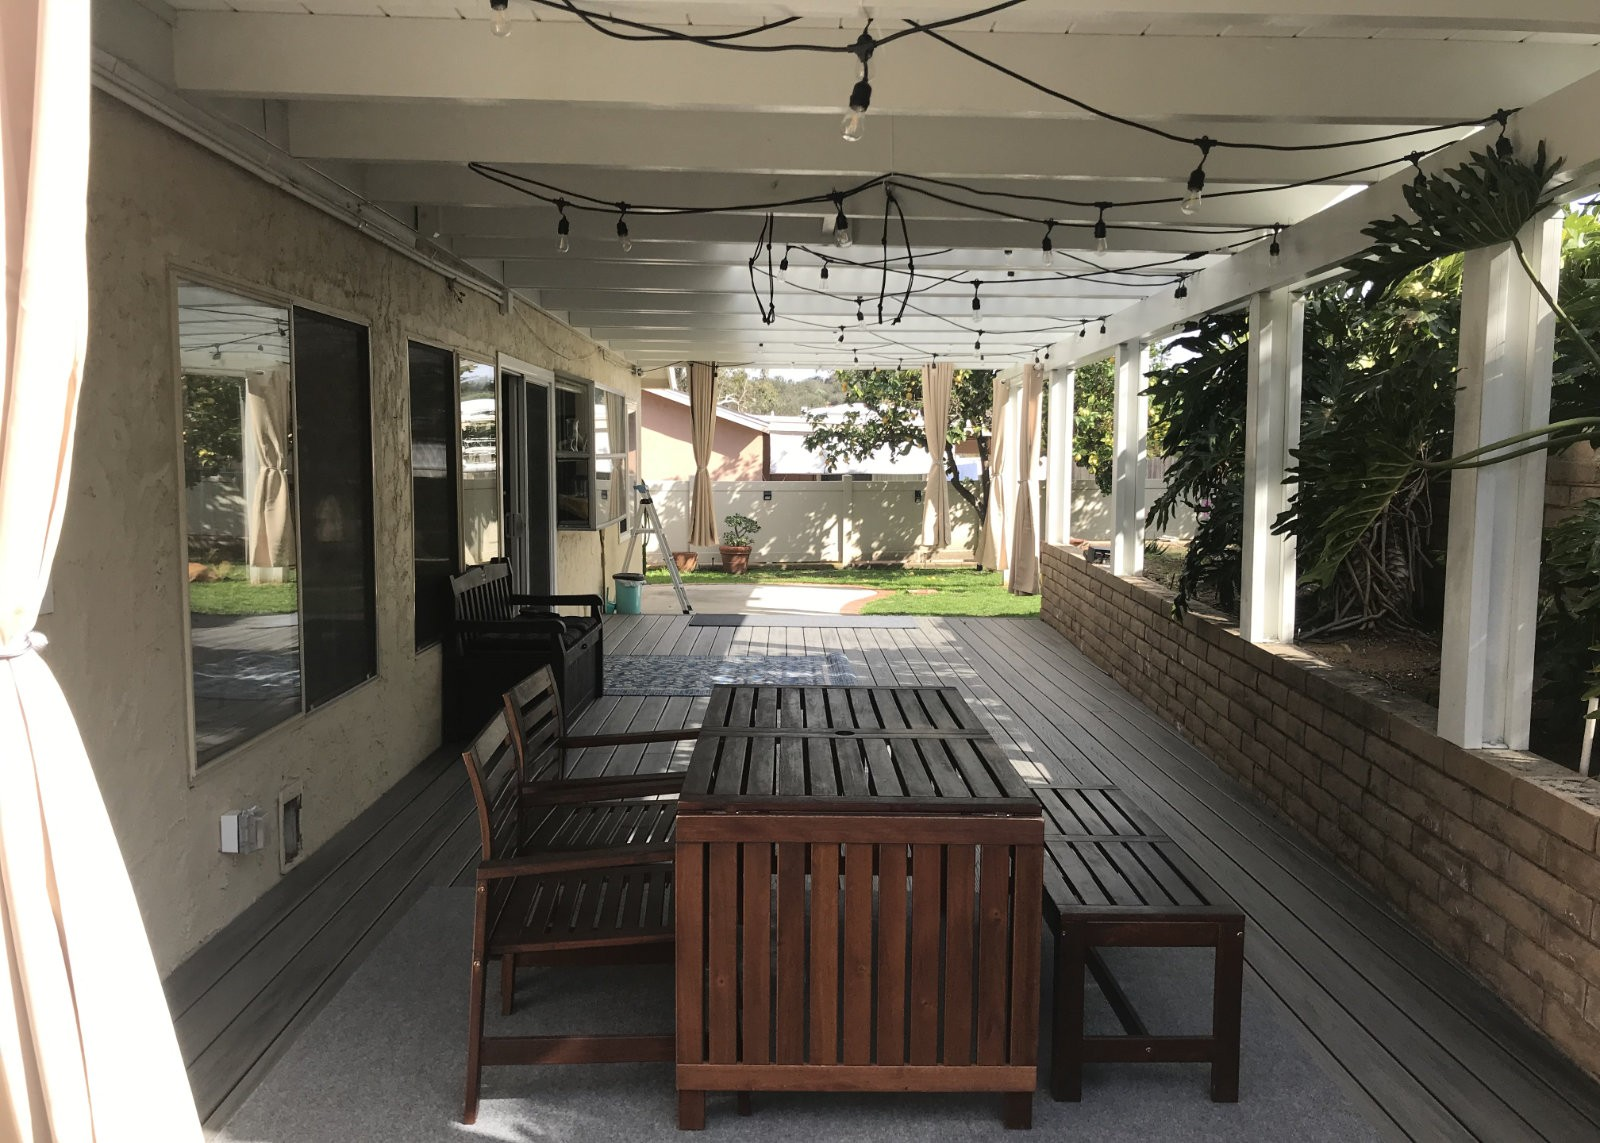 New Deck Installation in San Diego County